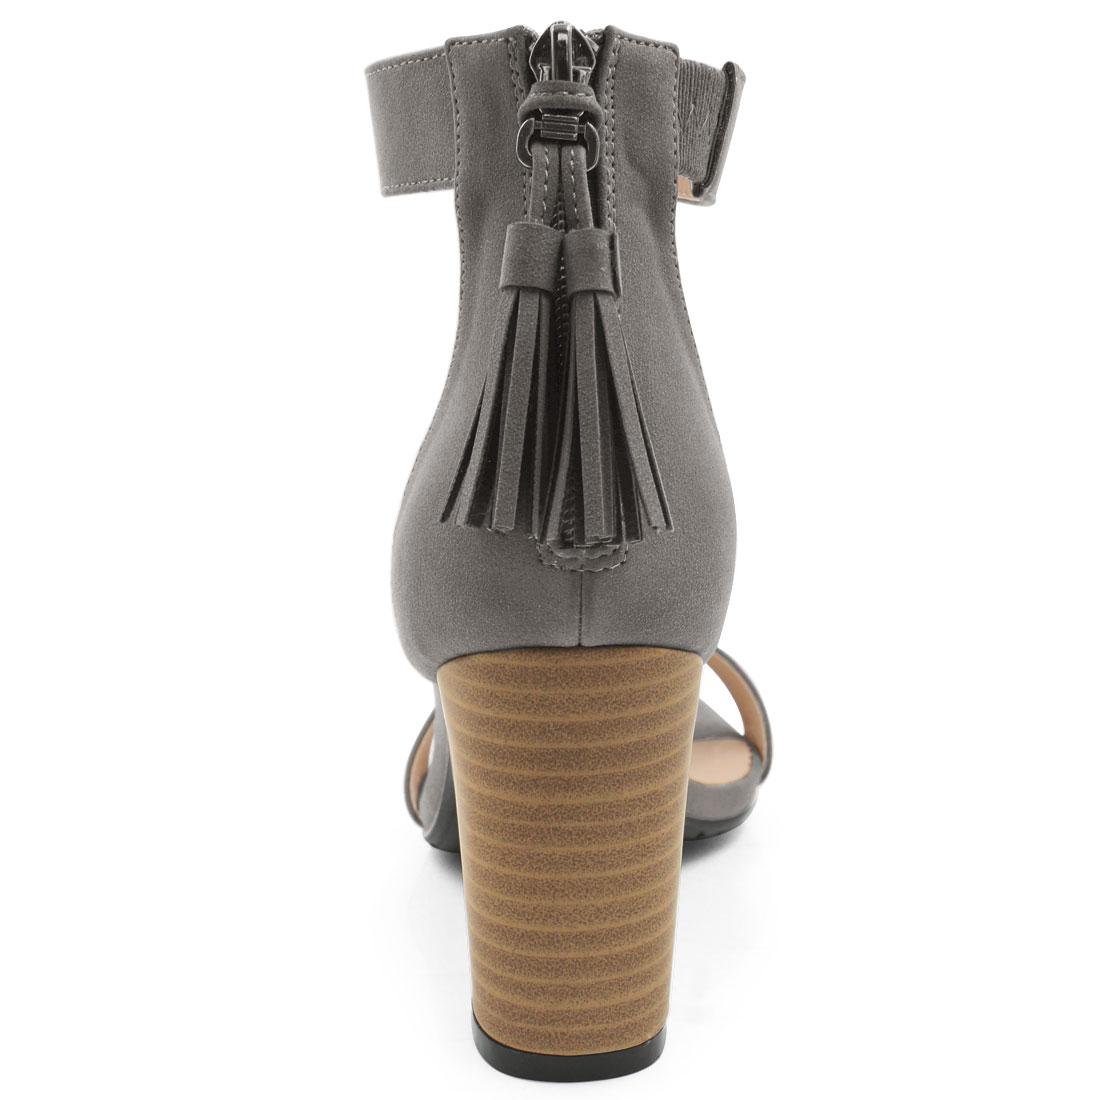 50c71208472 Unique Bargains Women s Open Toe Tassel Stacked Heel Ankle Strap Sandals  Dark Gray (Size 9